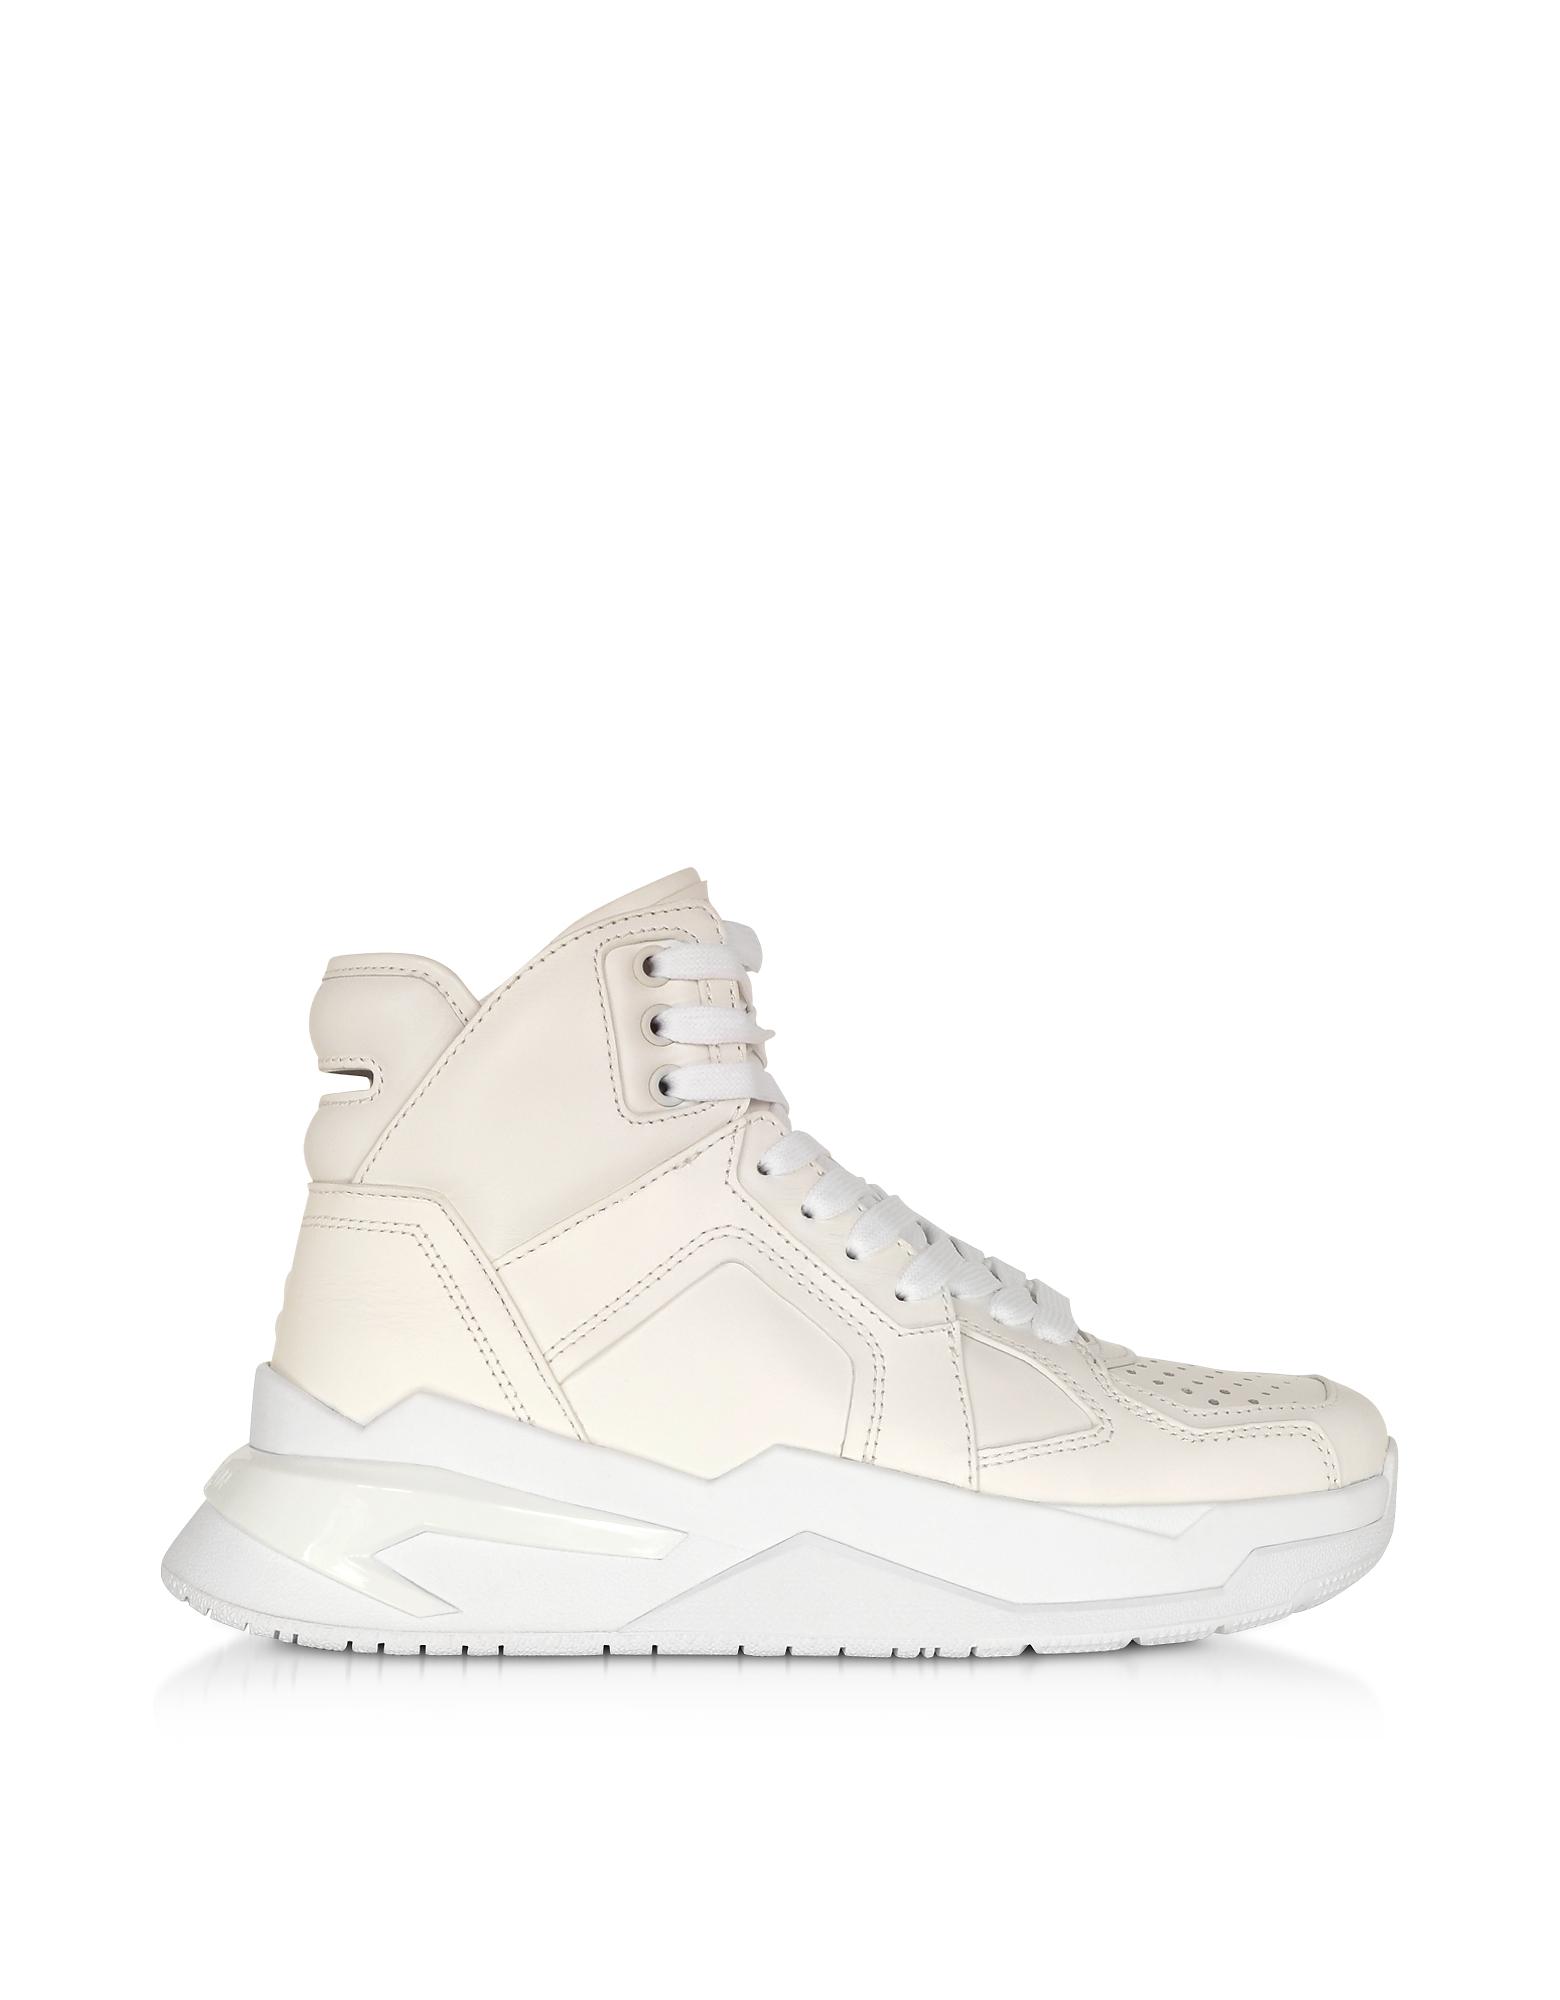 Balmain Designer Shoes, White B-Ball Calfskin Leather Sneakers